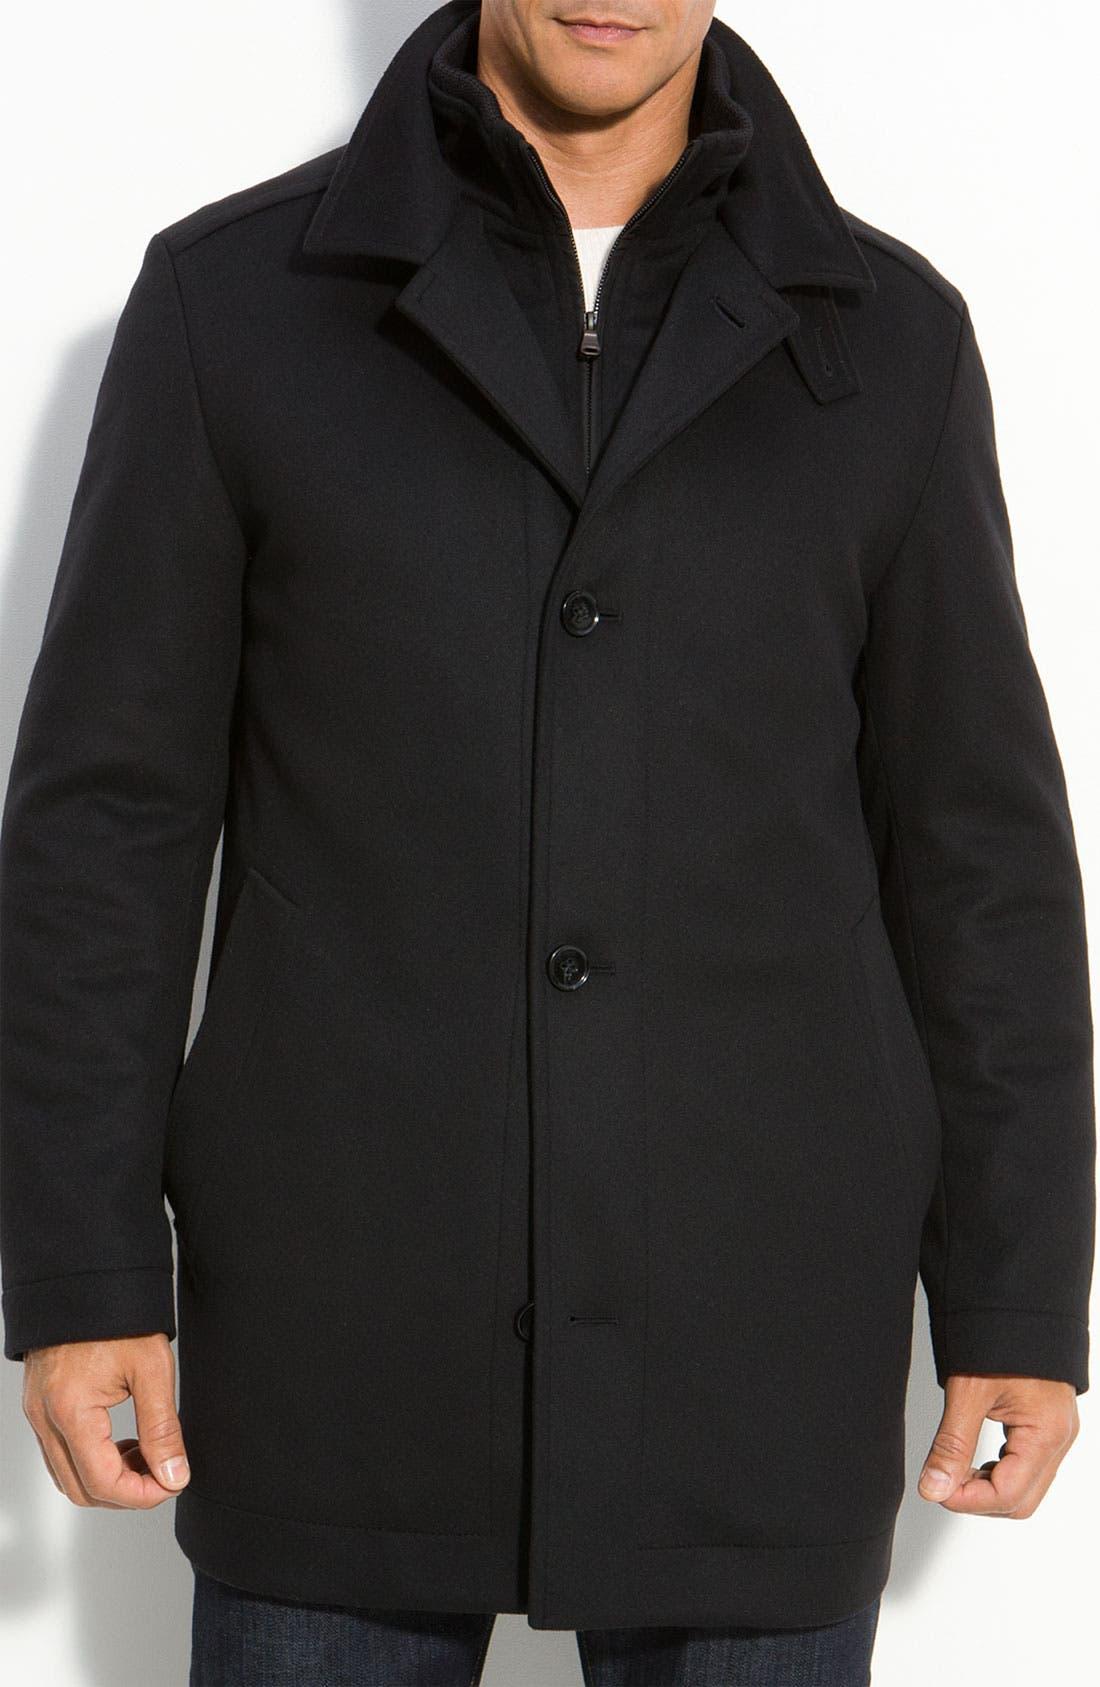 HUGO BOSS 'Coxtan' Wool & Cashmere Coat,                             Main thumbnail 1, color,                             001